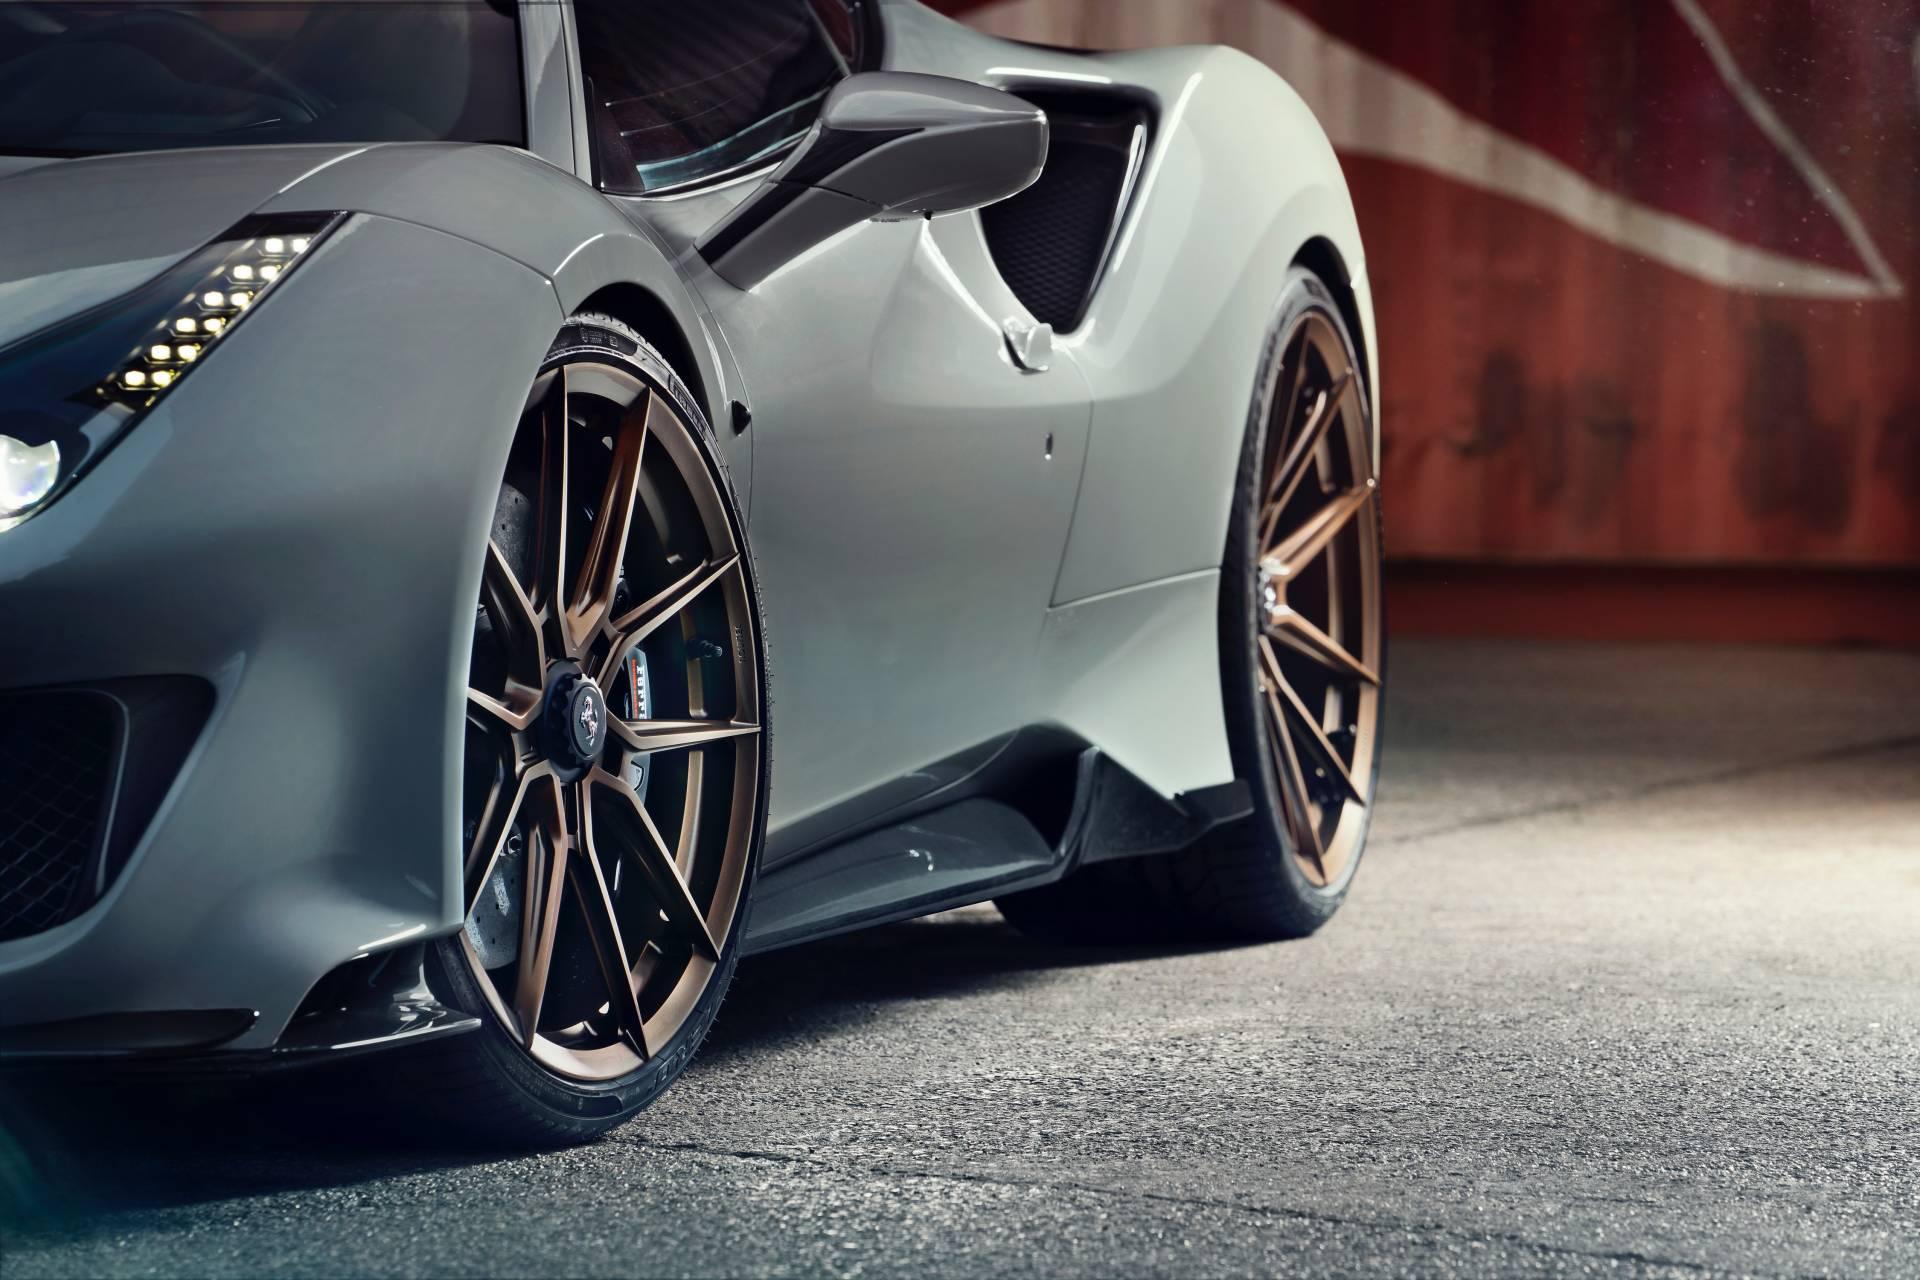 Ferrari-488-Pista-by-Novitec-11